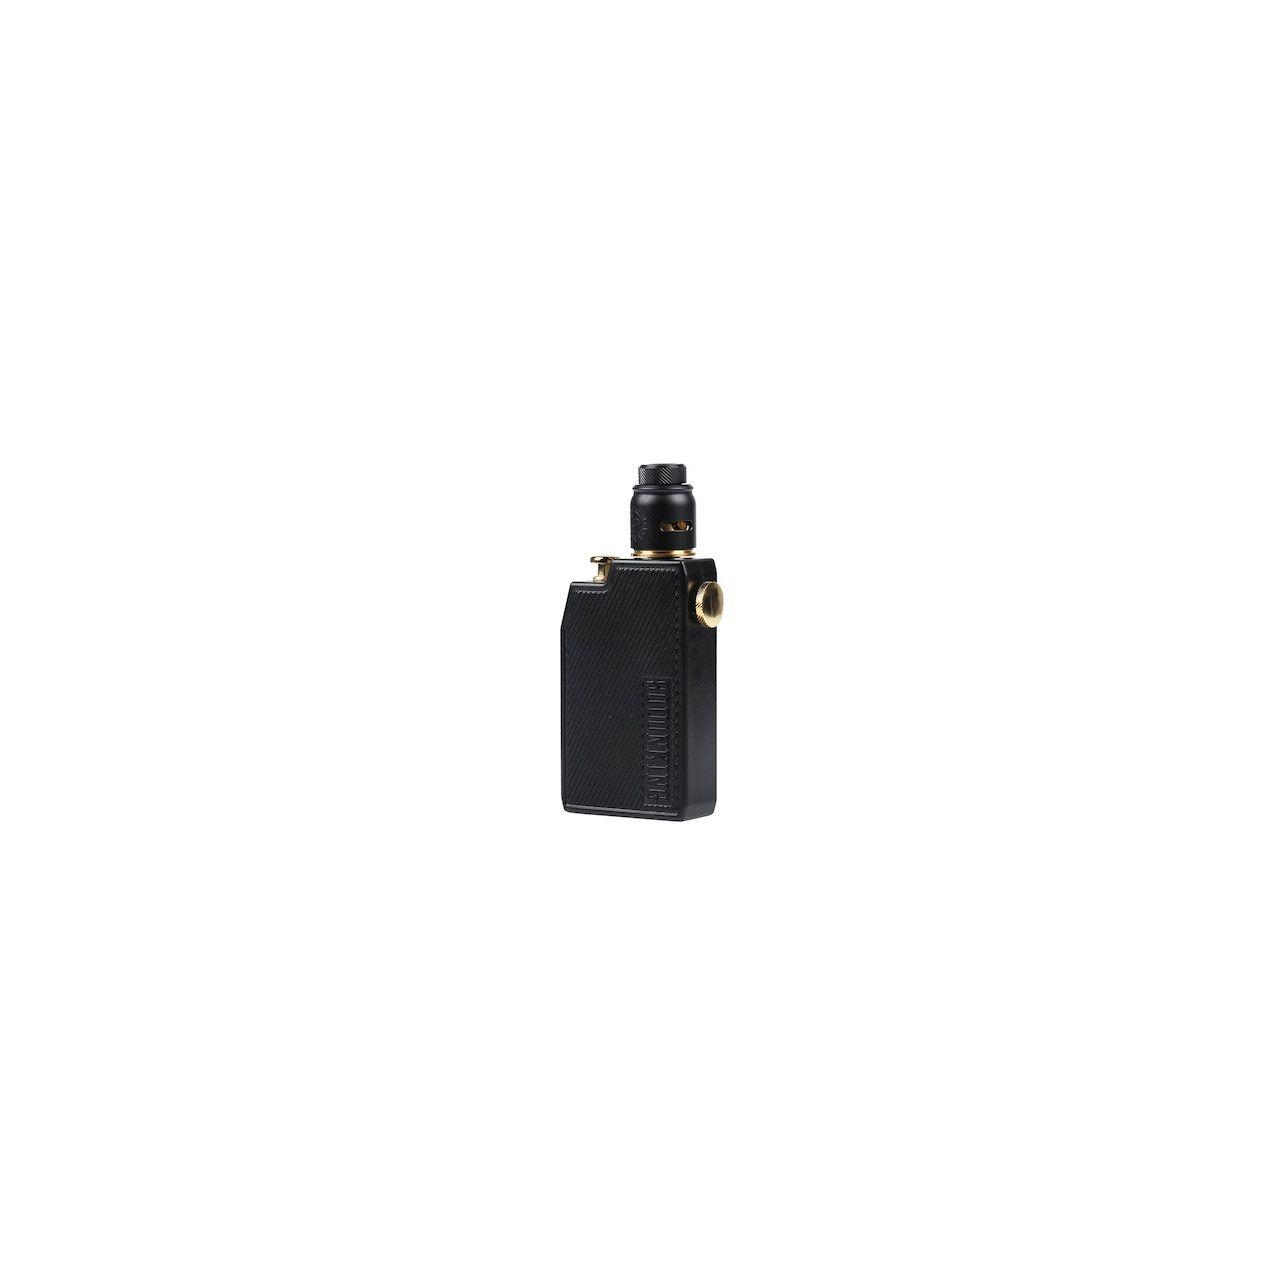 Vaporizador Advken CP Squonking Kit (Sem Baterias)